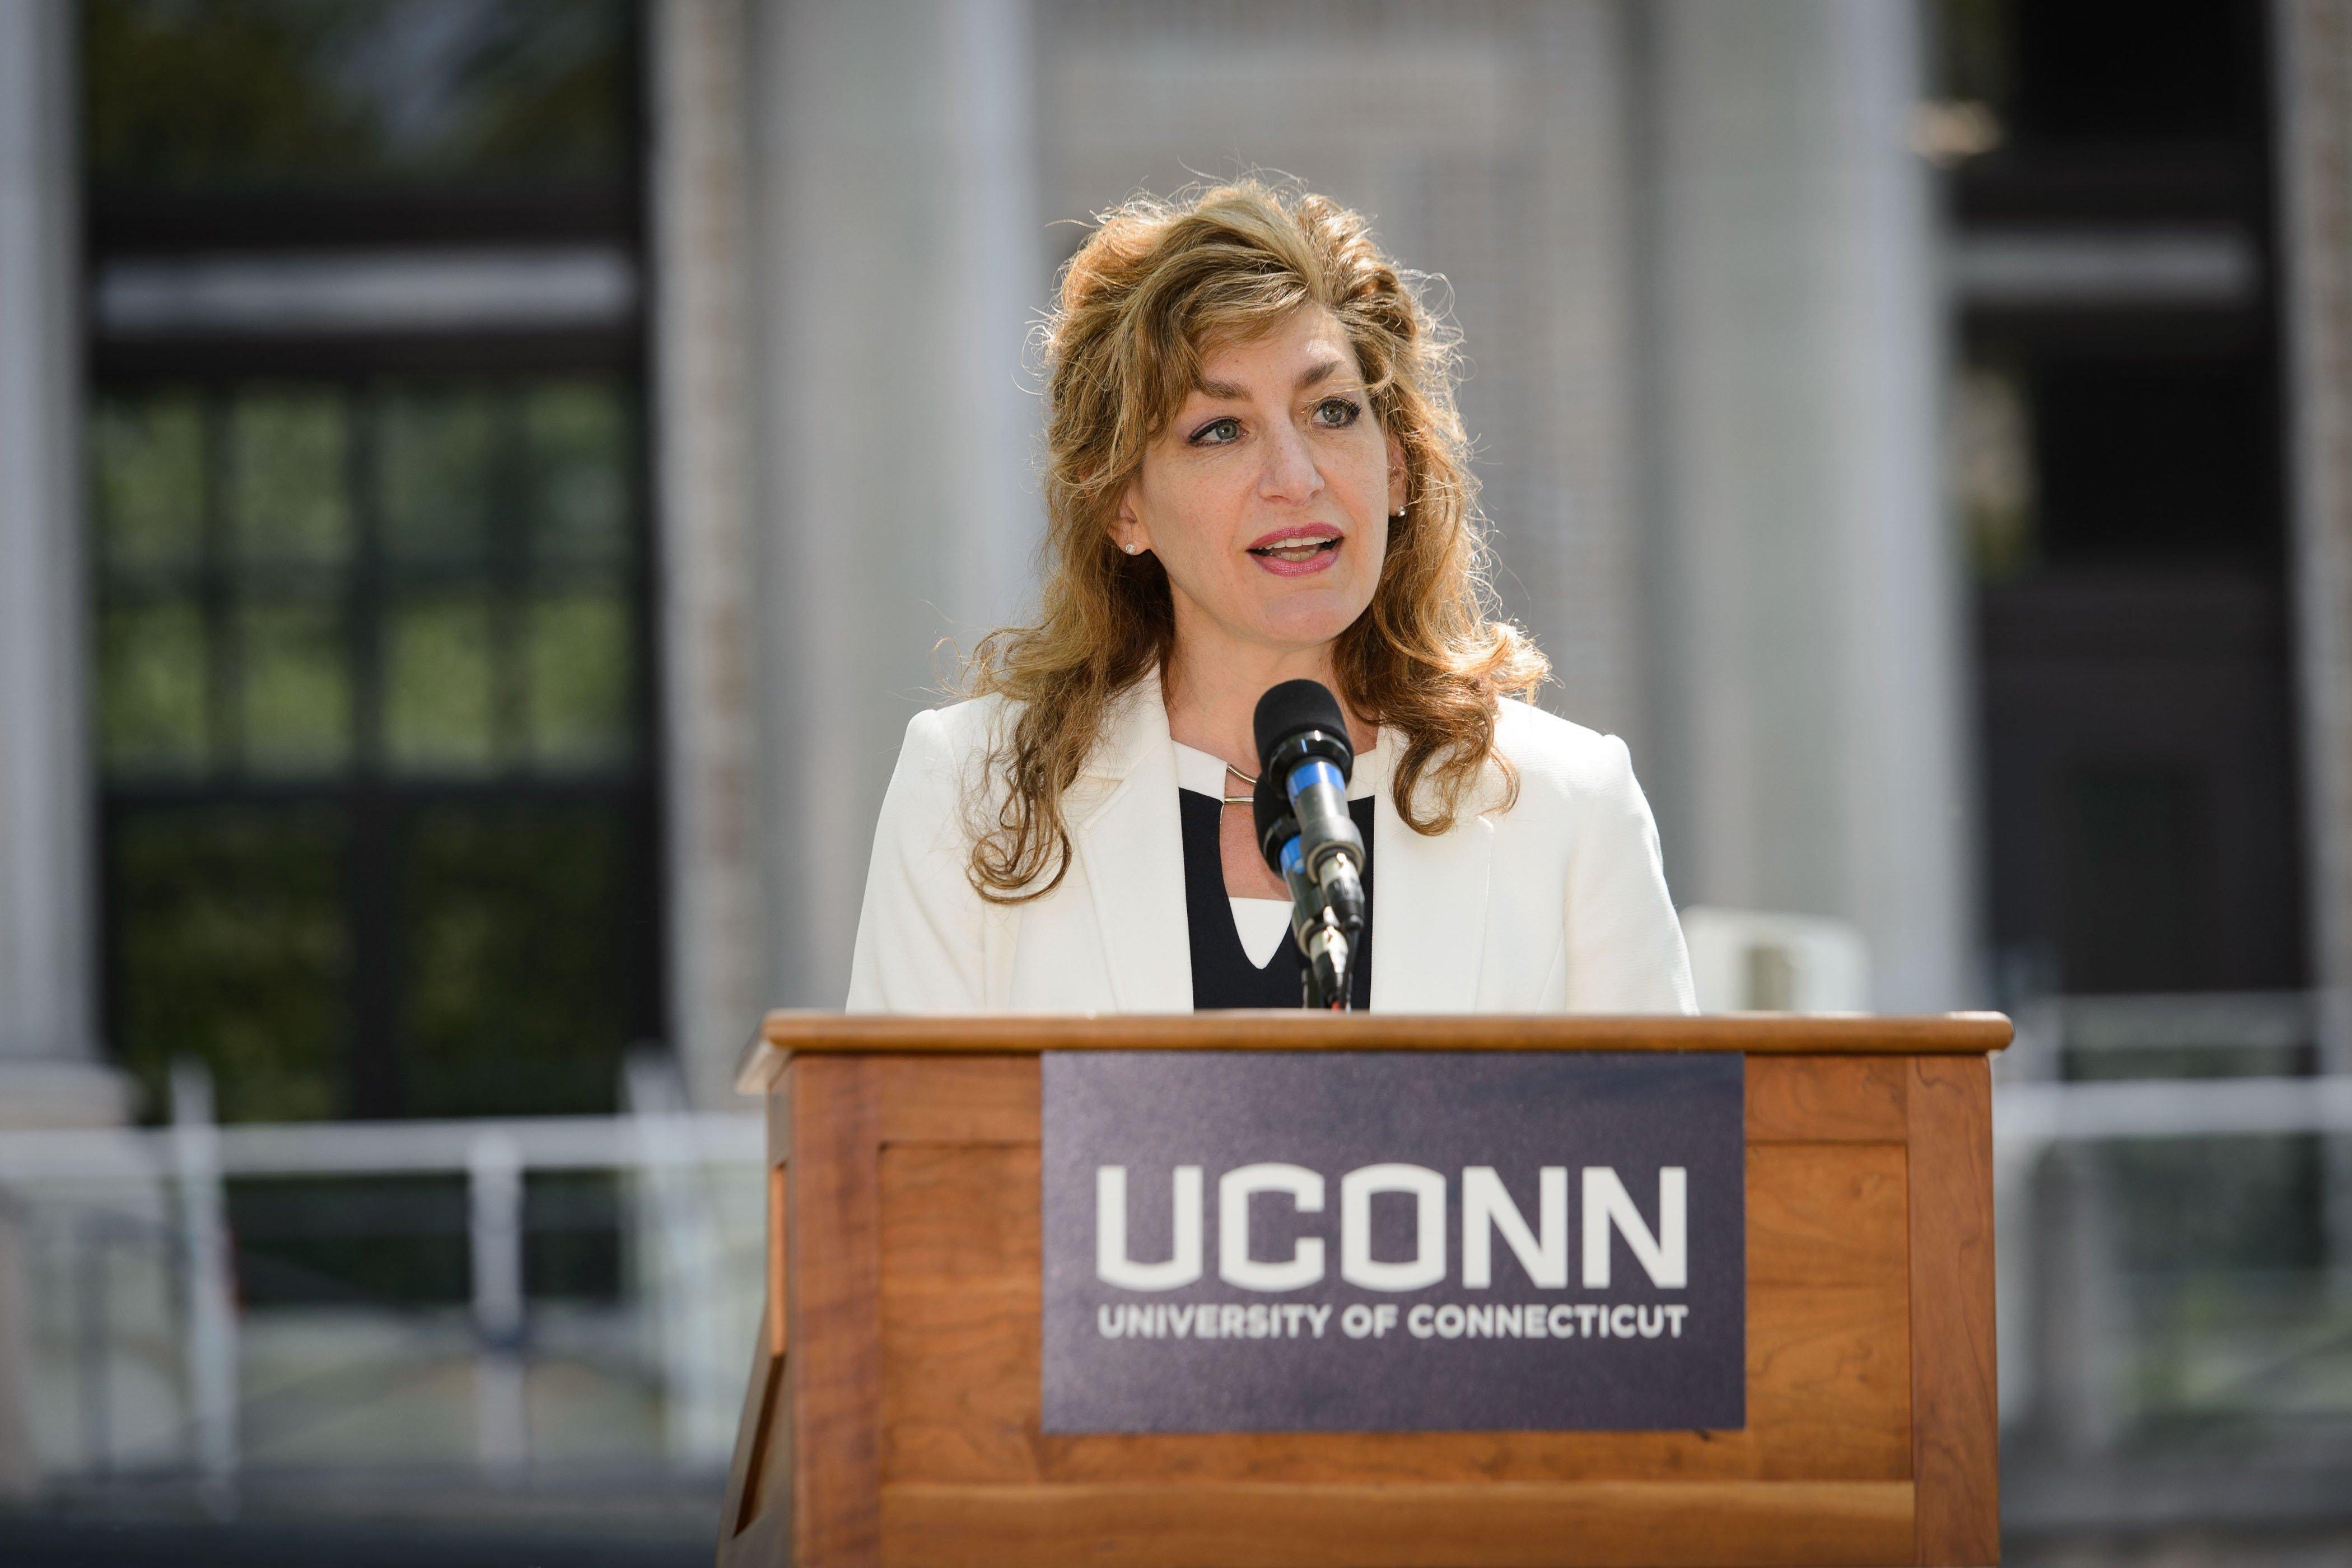 Searching For Uconn's Next Leader | Connecticut Law Tribune Calendar 2019 Uconn